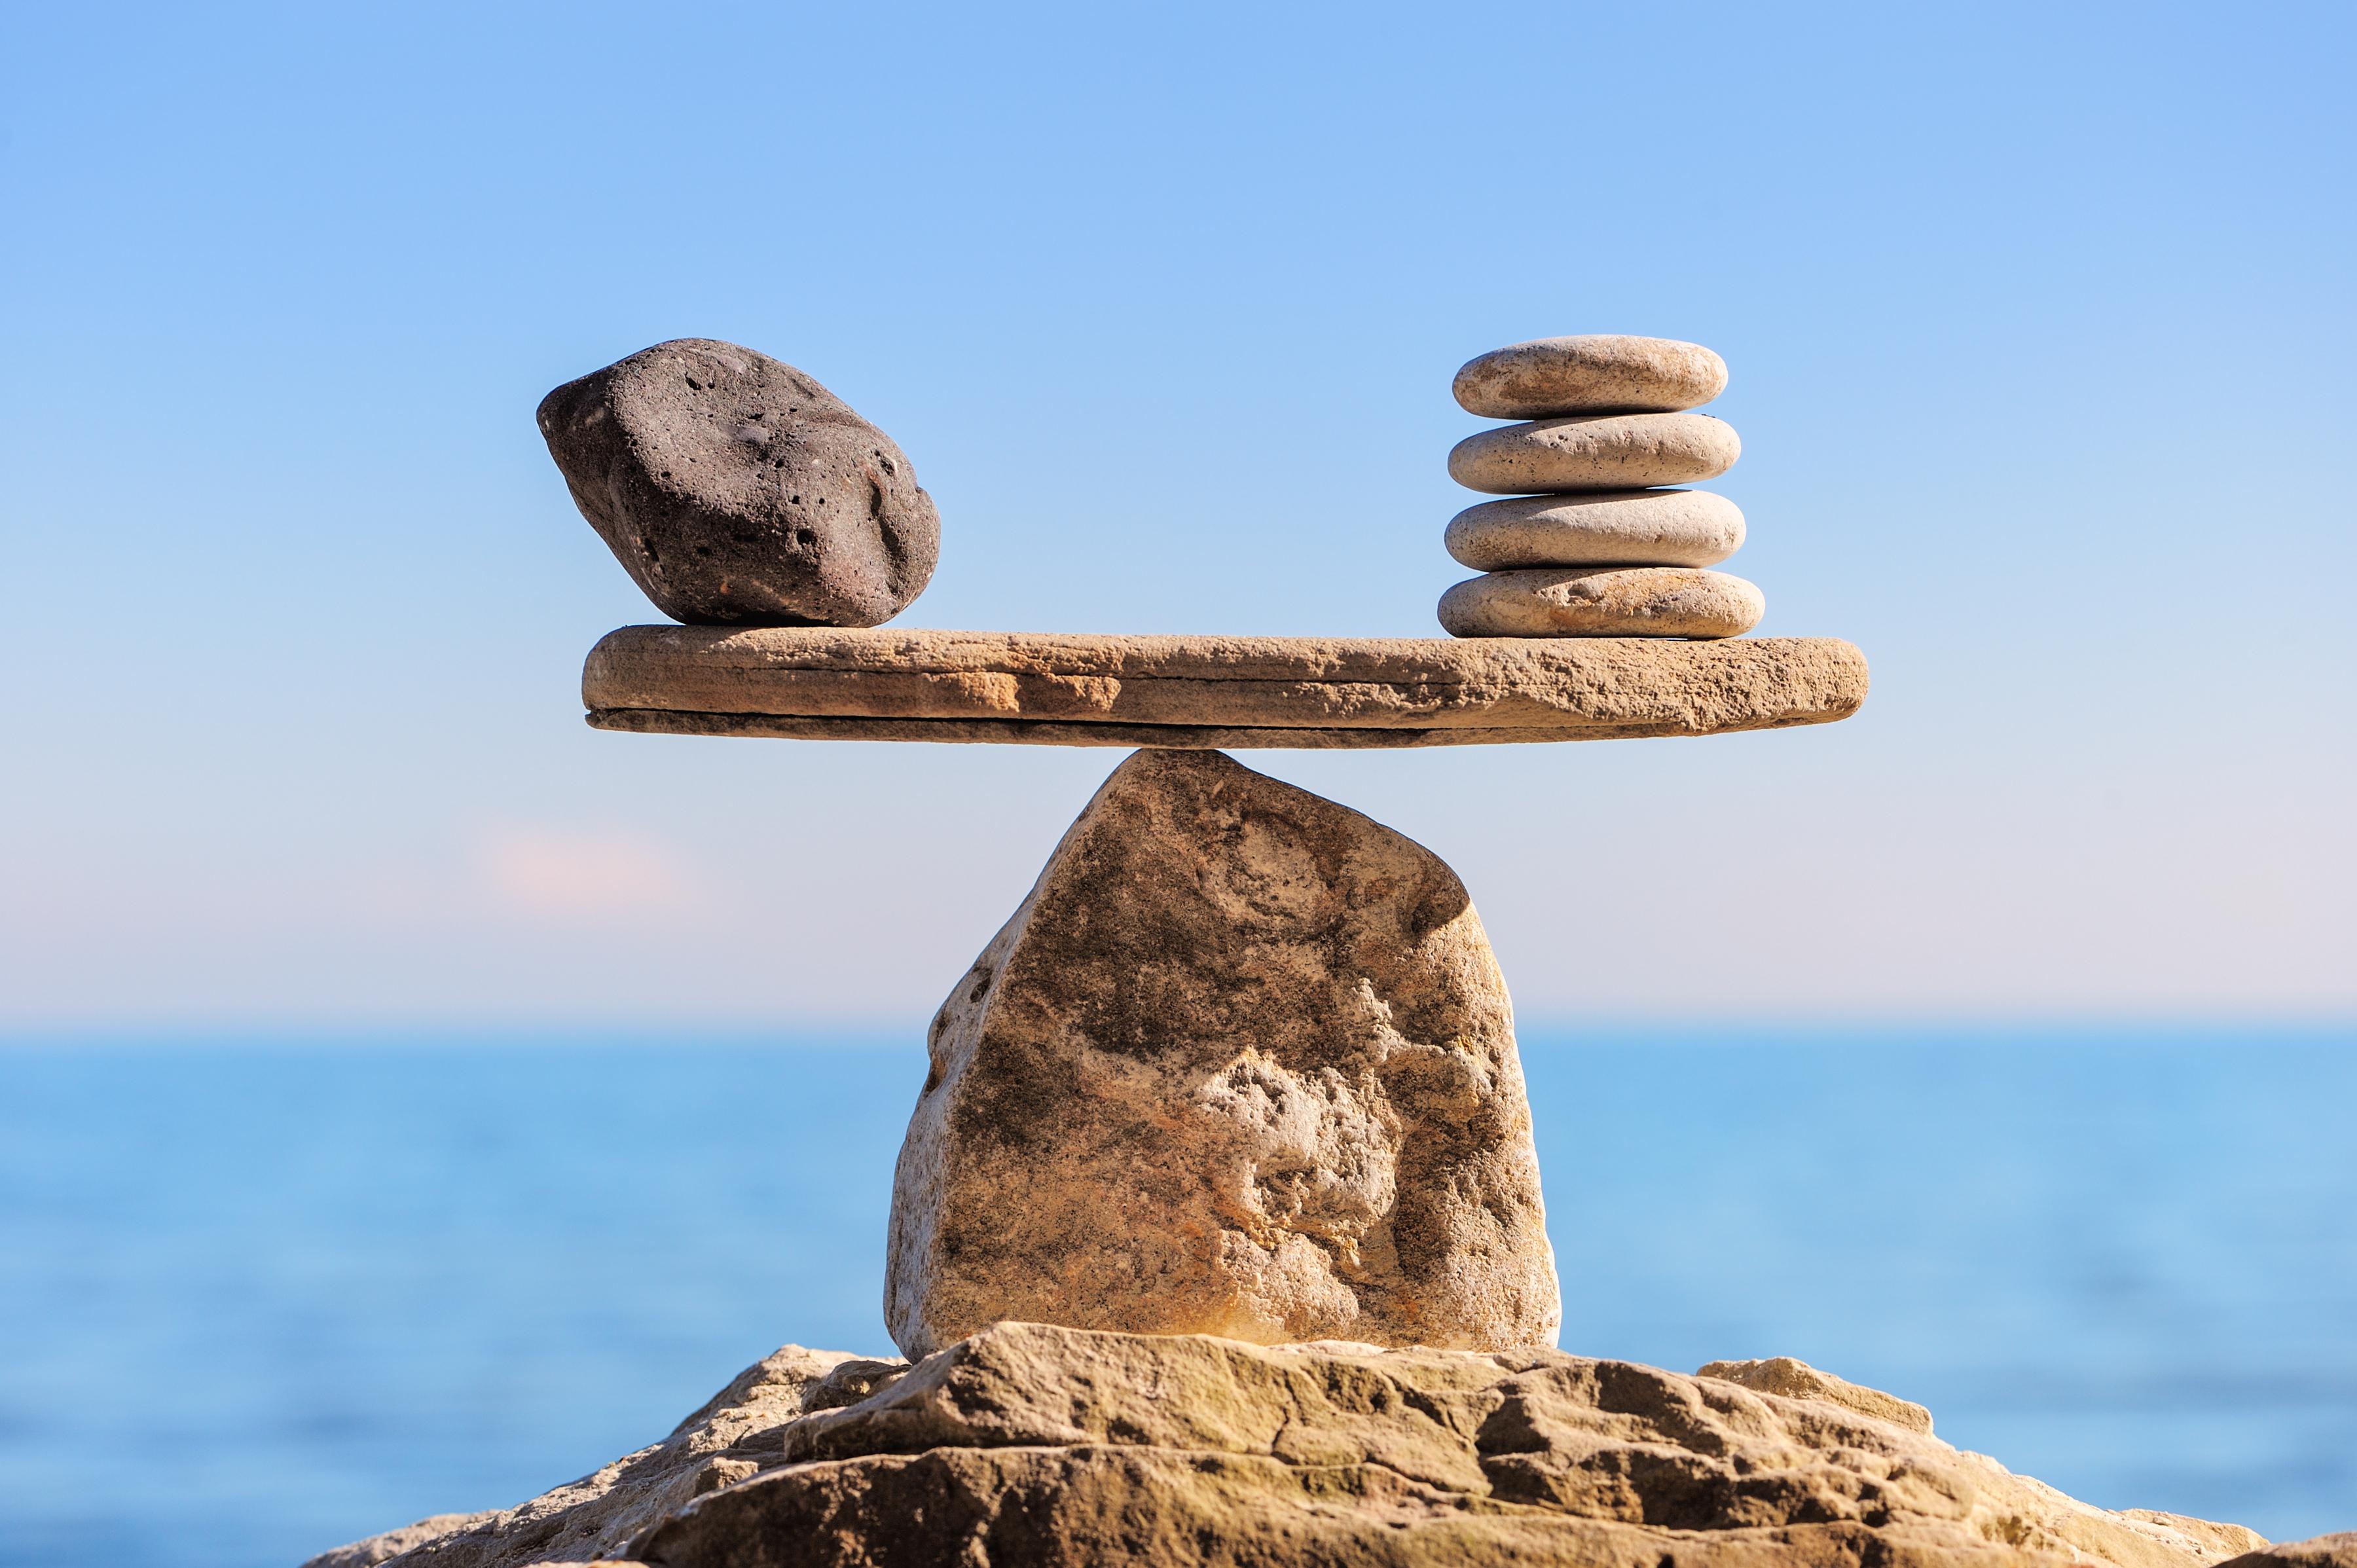 Rocks balanced on a beam.